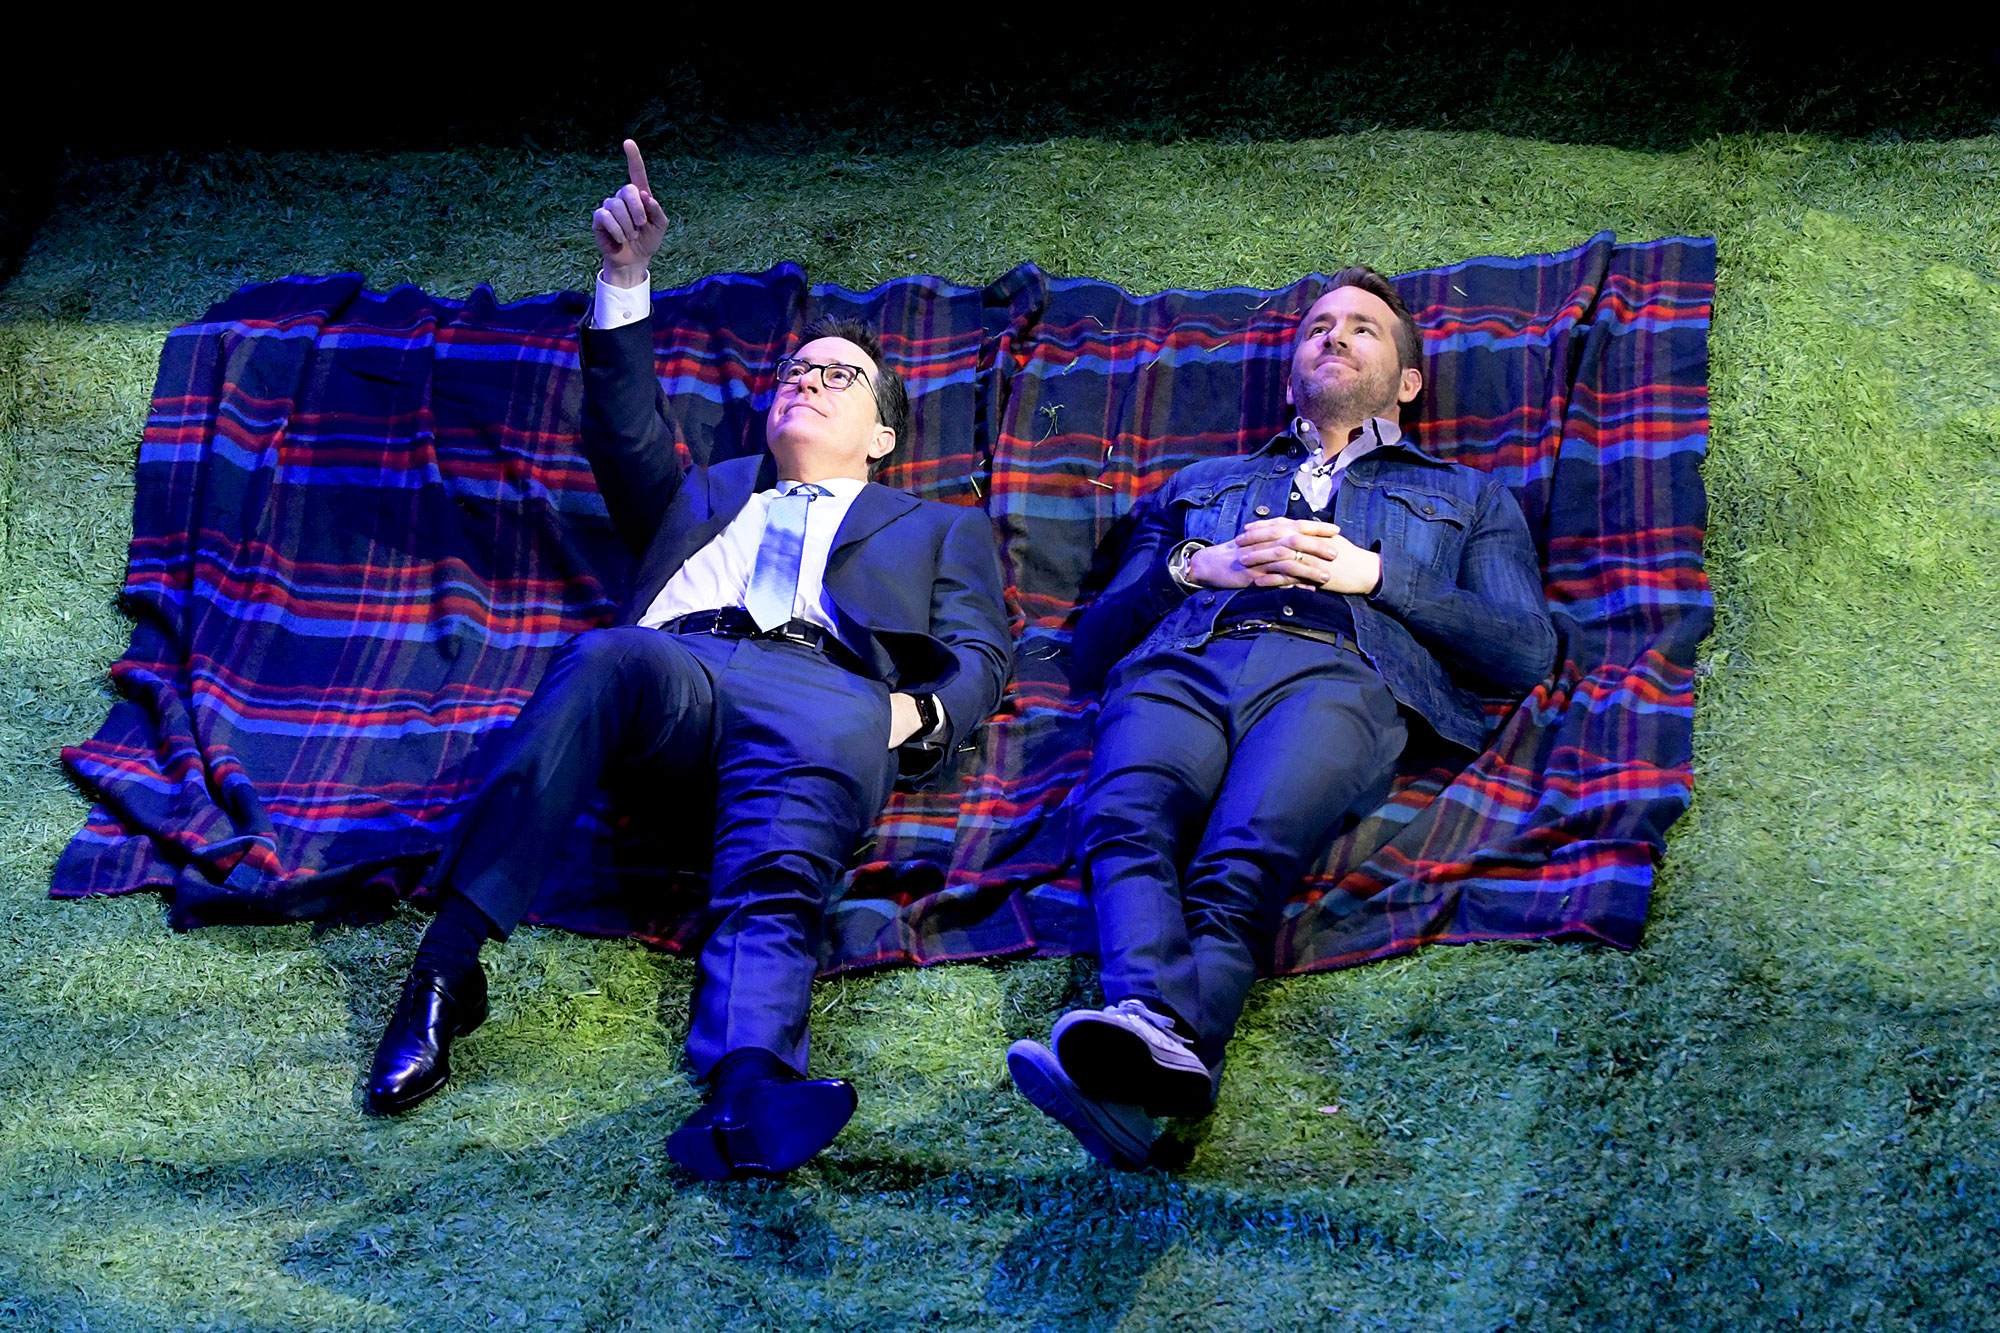 Stephen Colbert and Ryan Reynolds